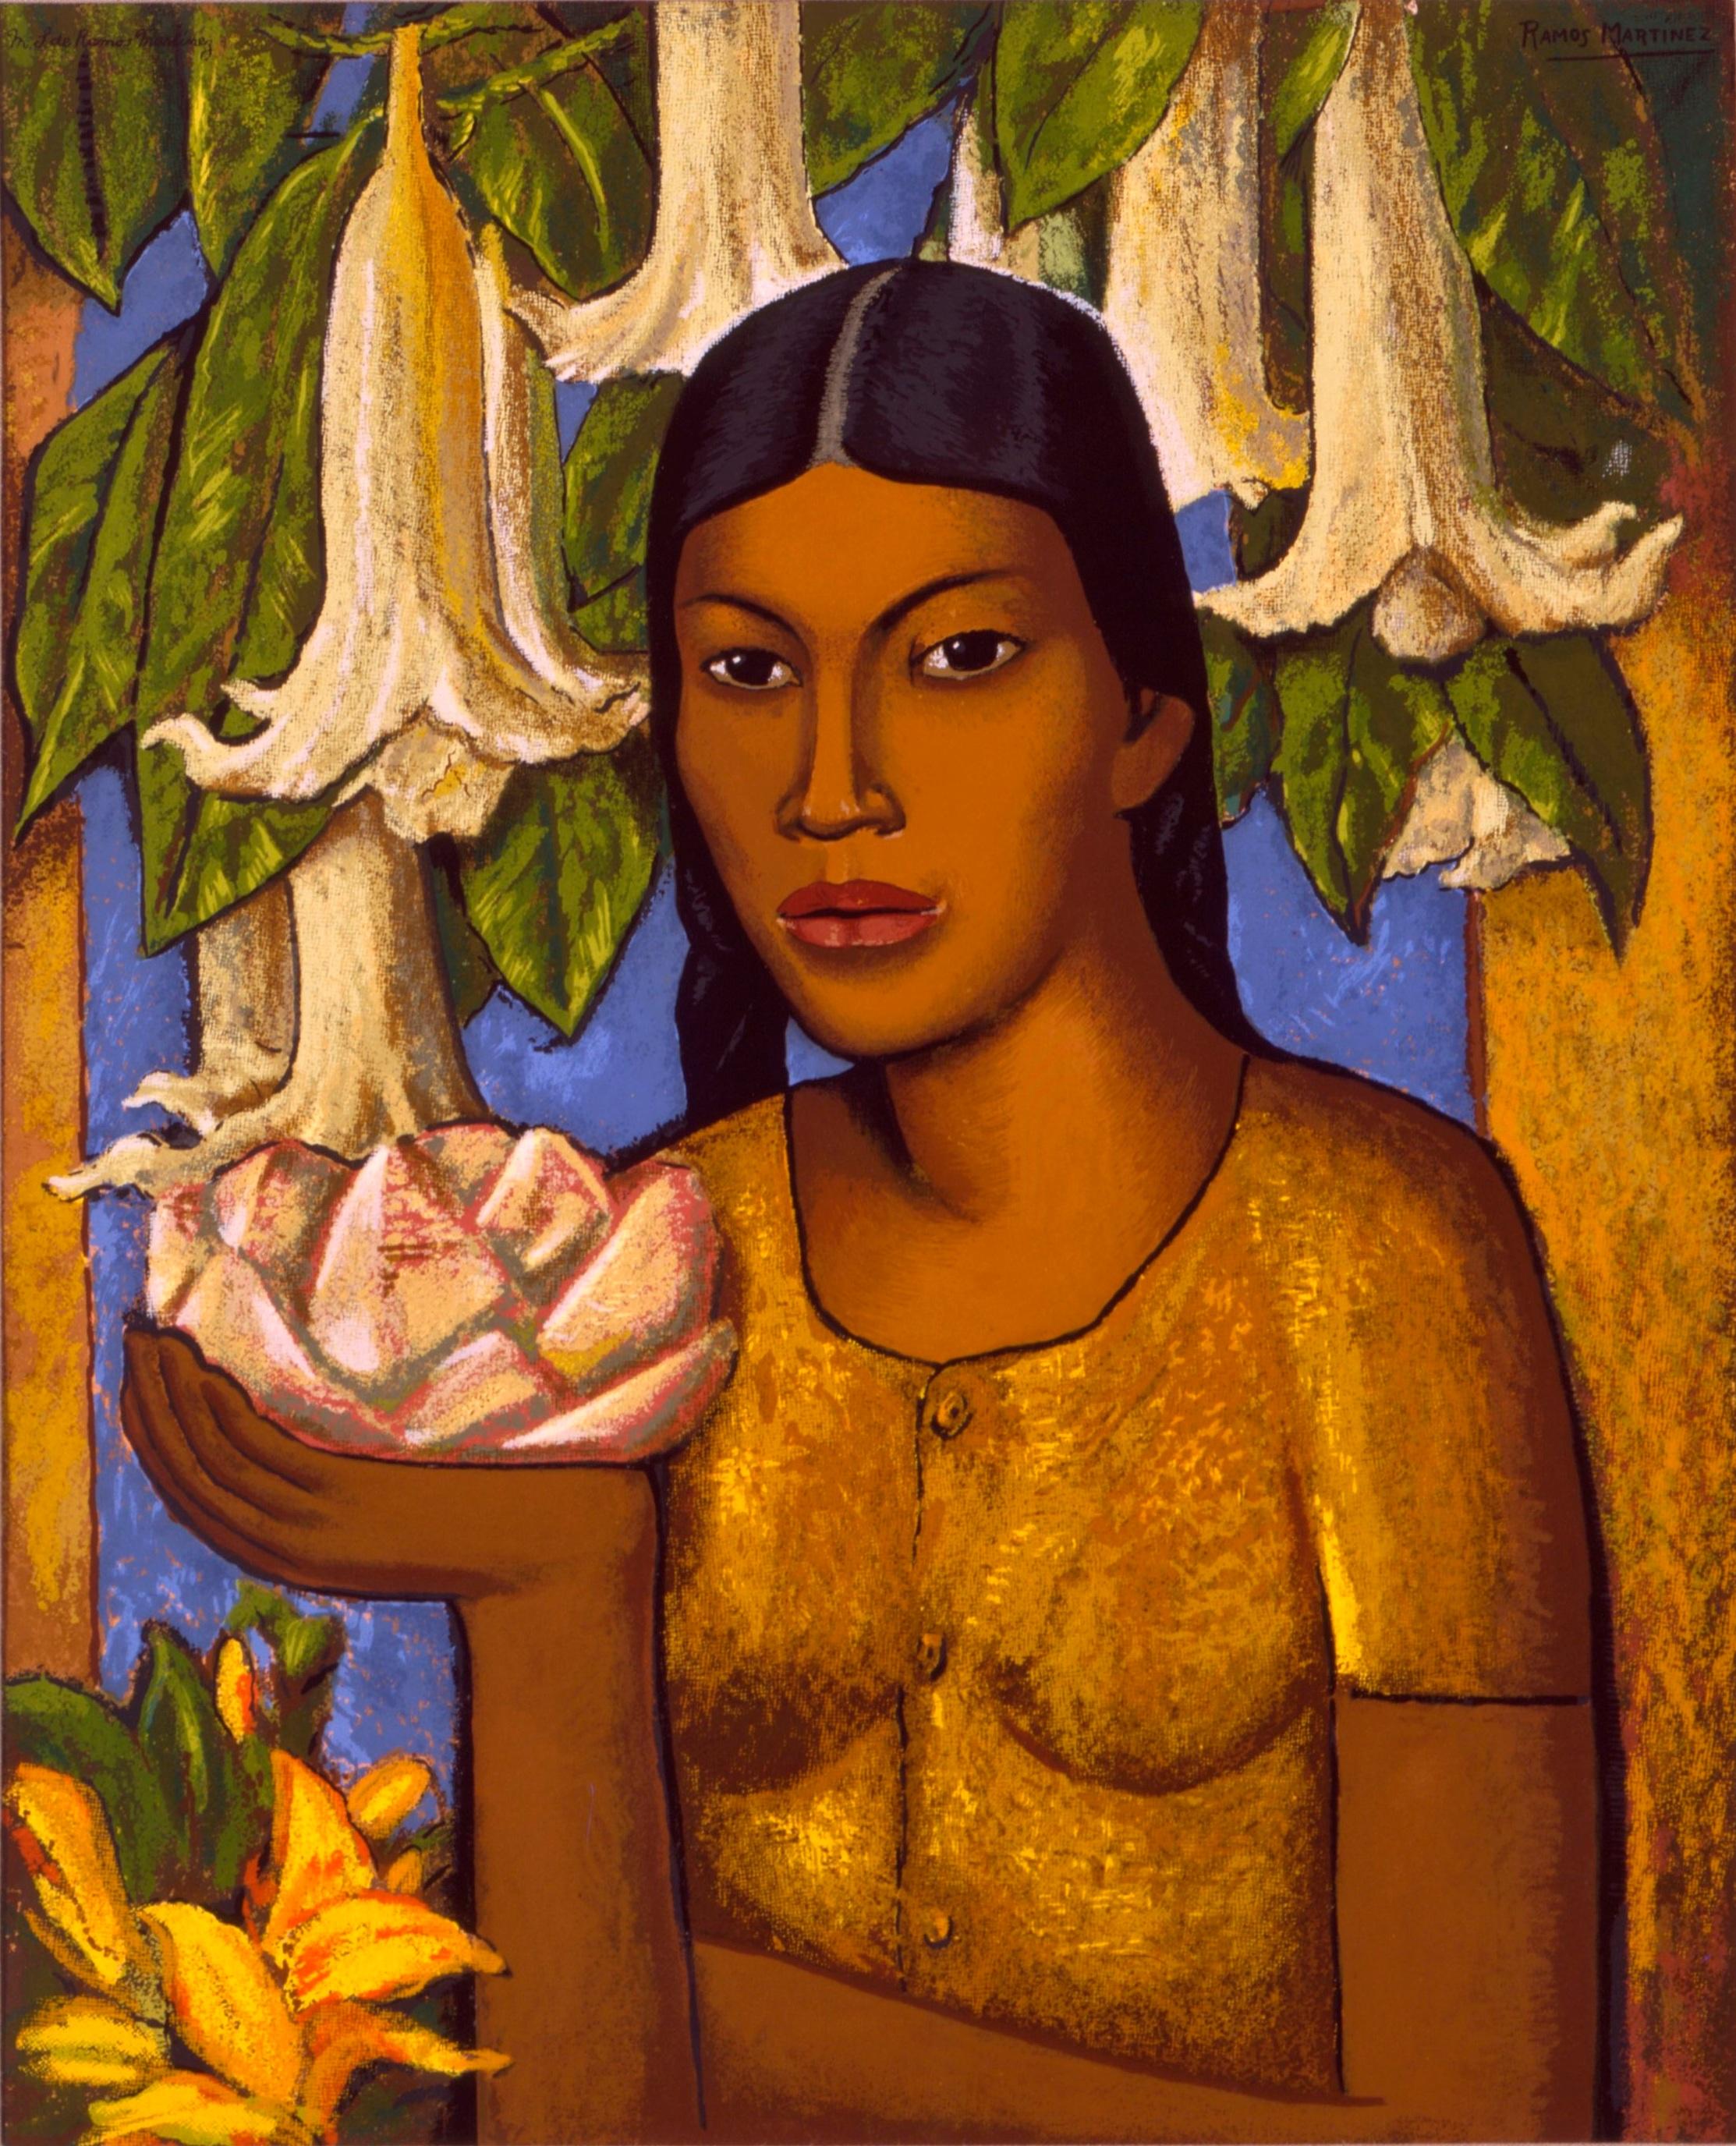 La India de los Floripondios / Indian Girl with Trumpet Flowers  ca. 1932 oil on canvas / óleo sobre tela 30 x 24 inches; 76.2 x 61 centímetros Private collection